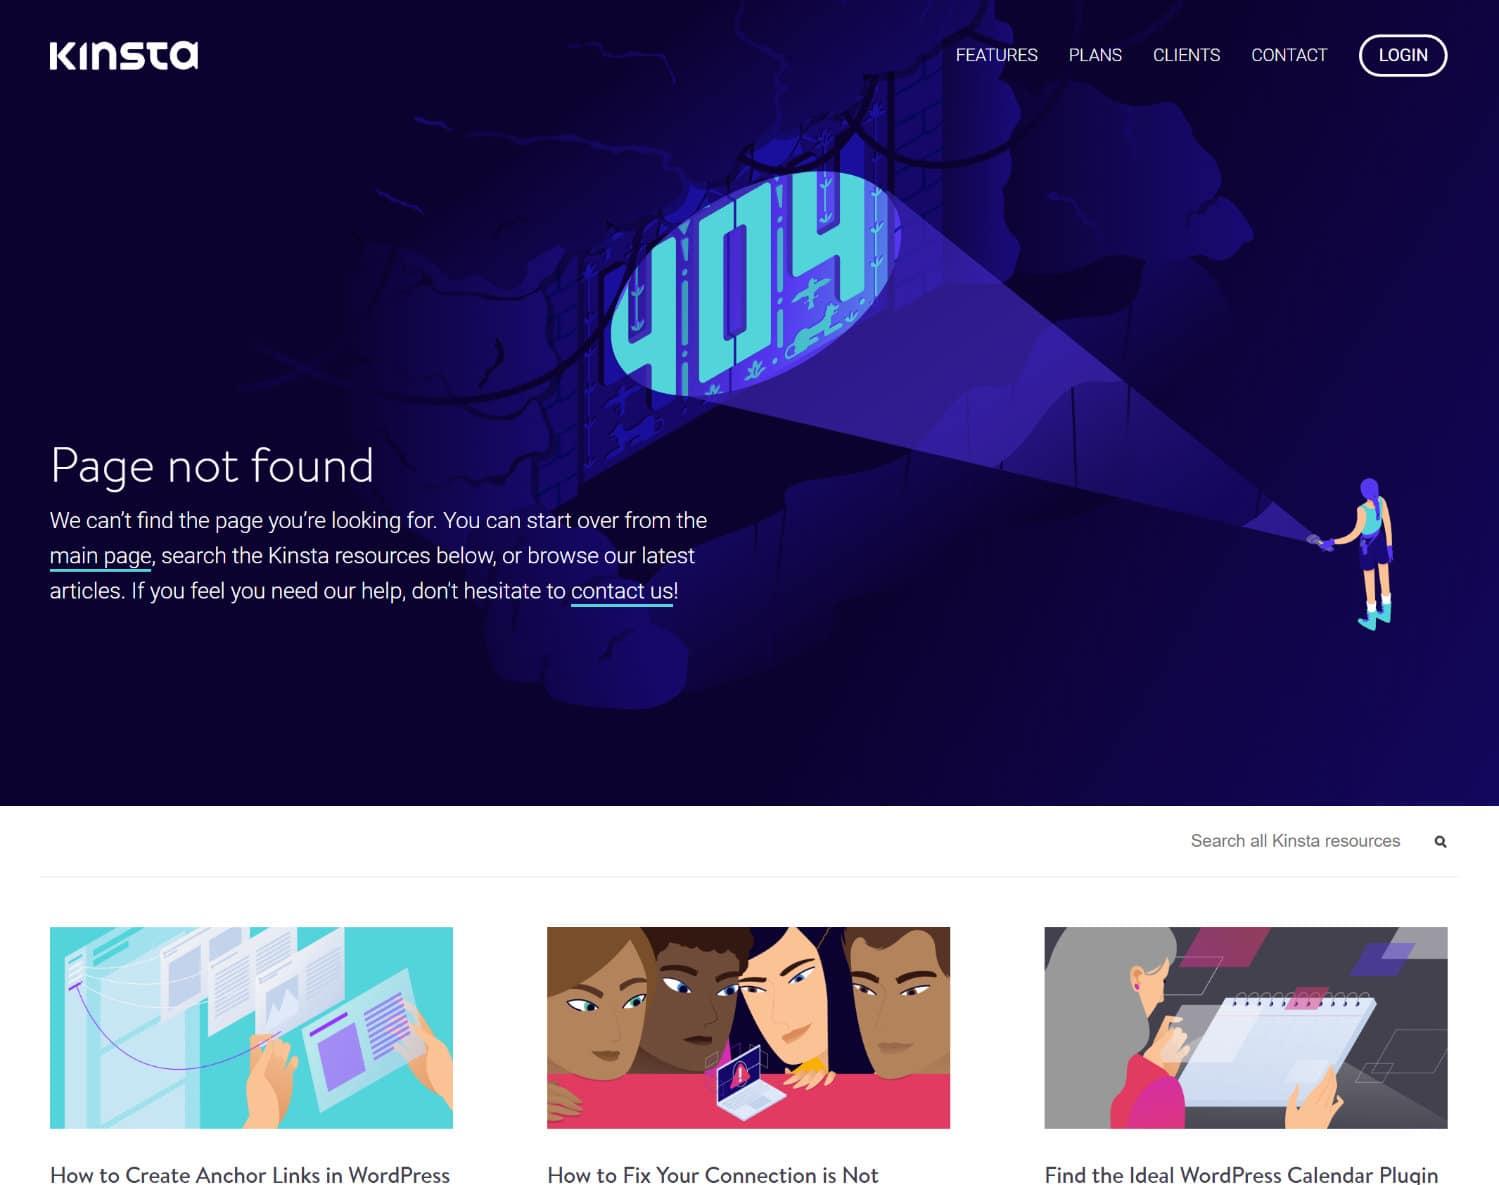 Kinsta 404 page